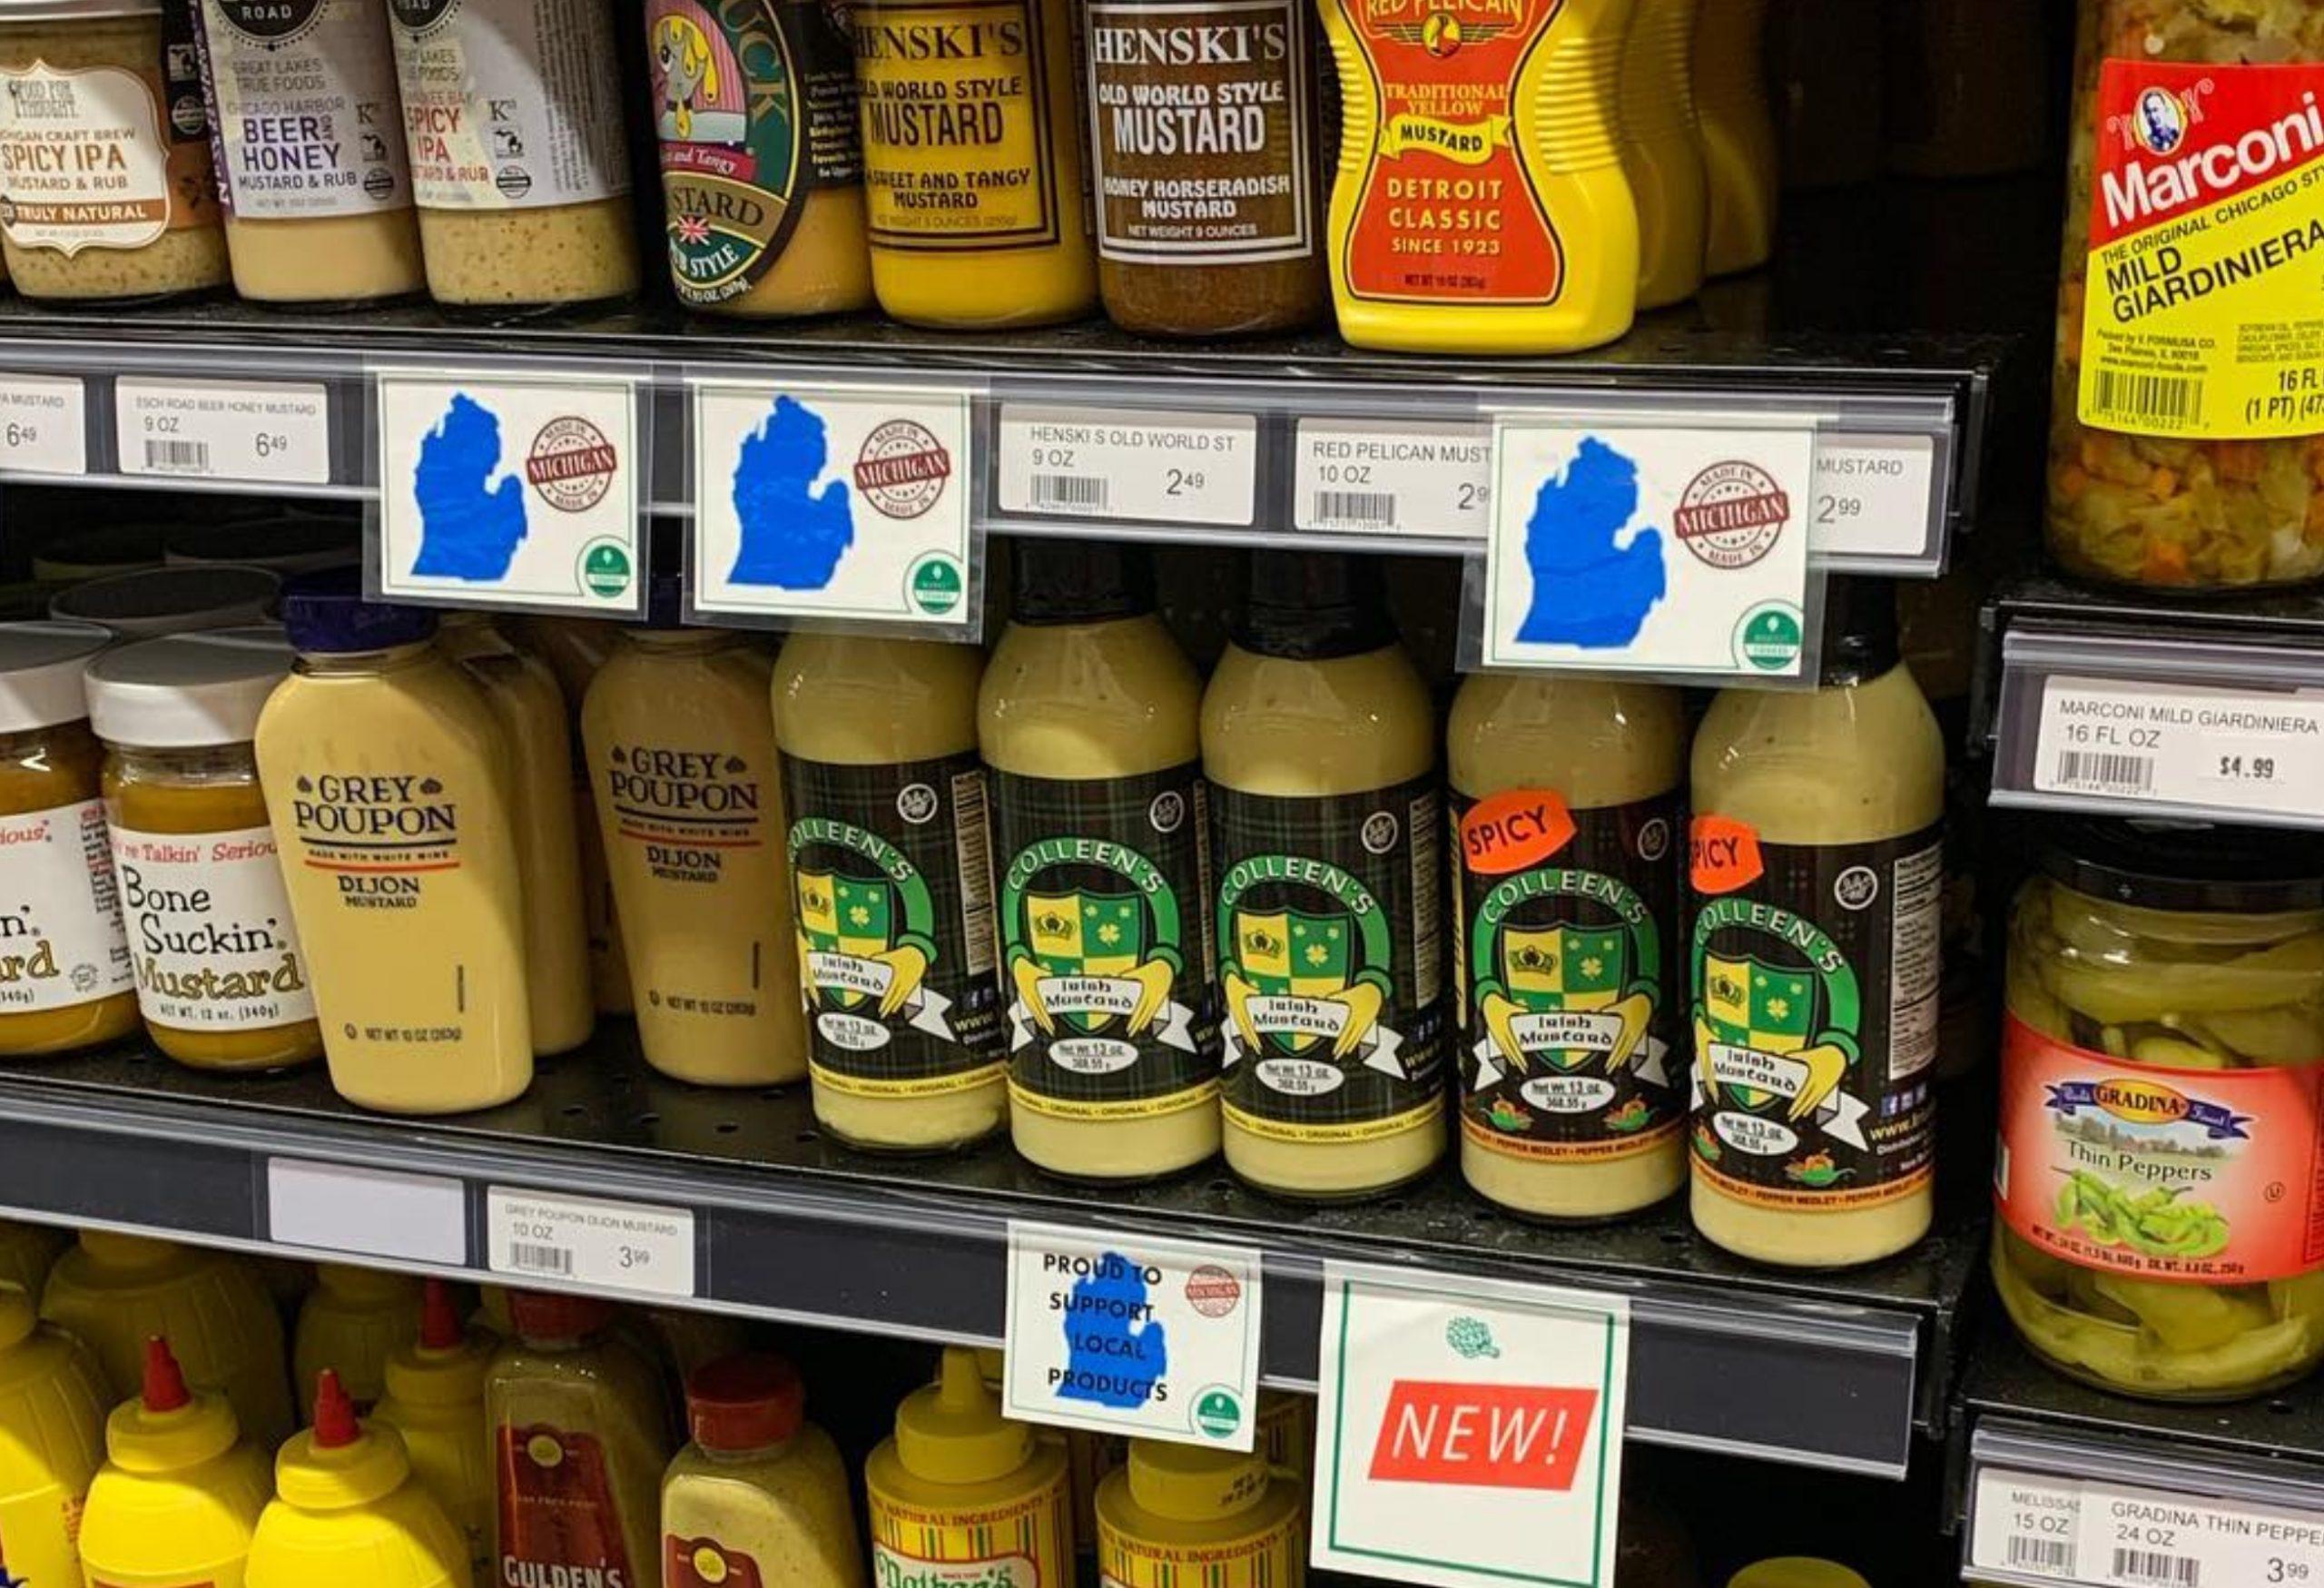 Colleens Irish Mustard - Mustard Label 06